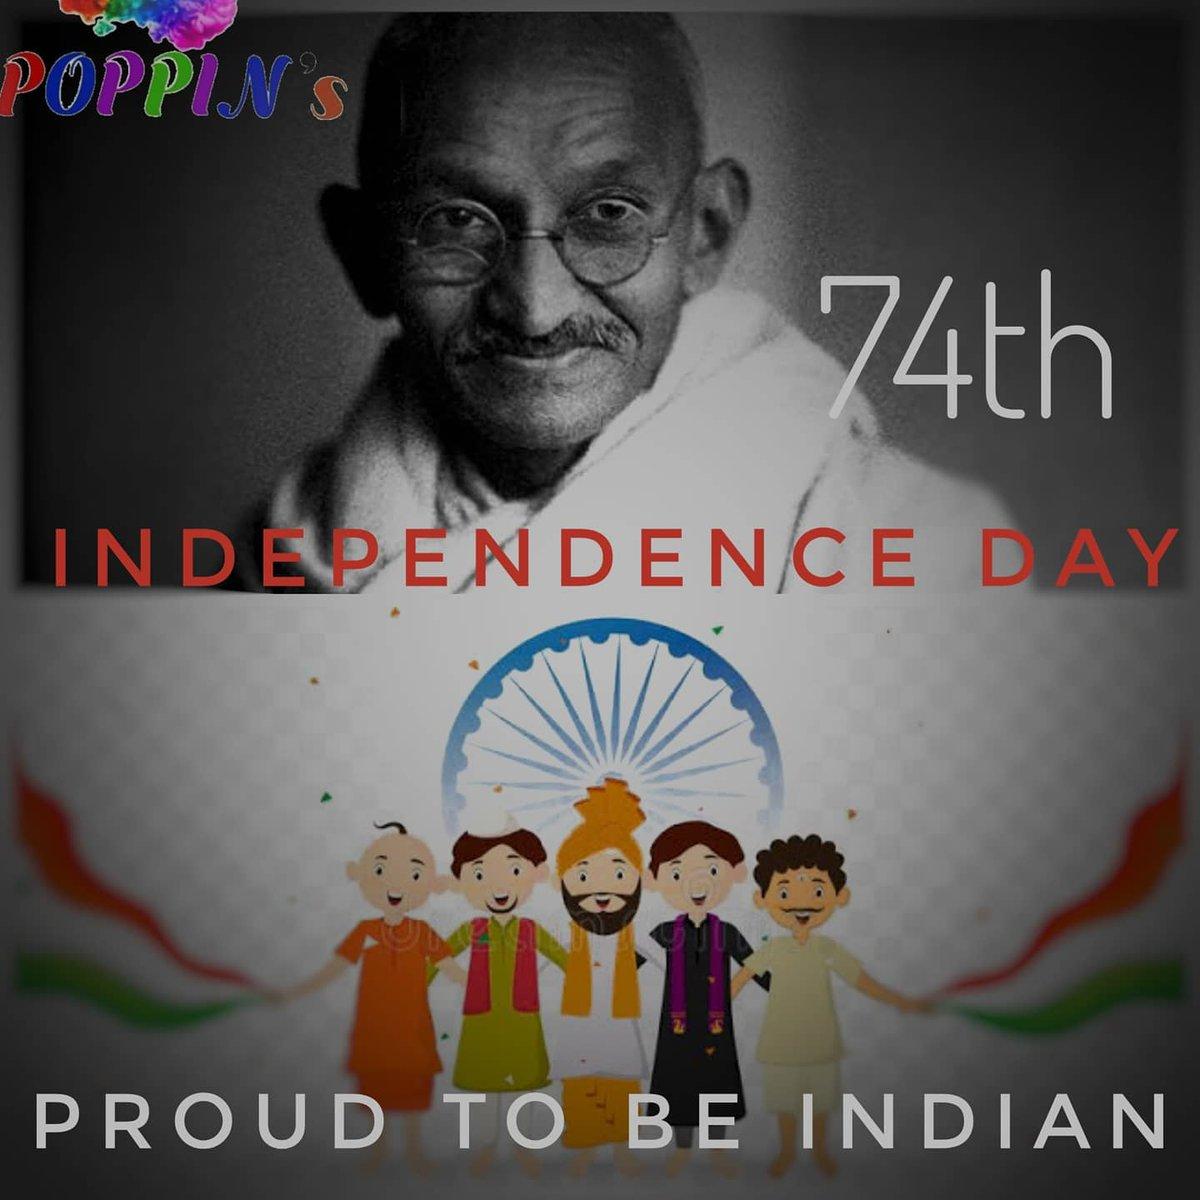 Happy independence day for all....🇮🇳 #jaihind #stayhomestaysafe #internationalnews #worldnews #world #newsfeed #indianewsupdates #india #kerala #indepedenceday #IndependenceDayIndia #indepedenceday2020 https://t.co/j8BeED3jir